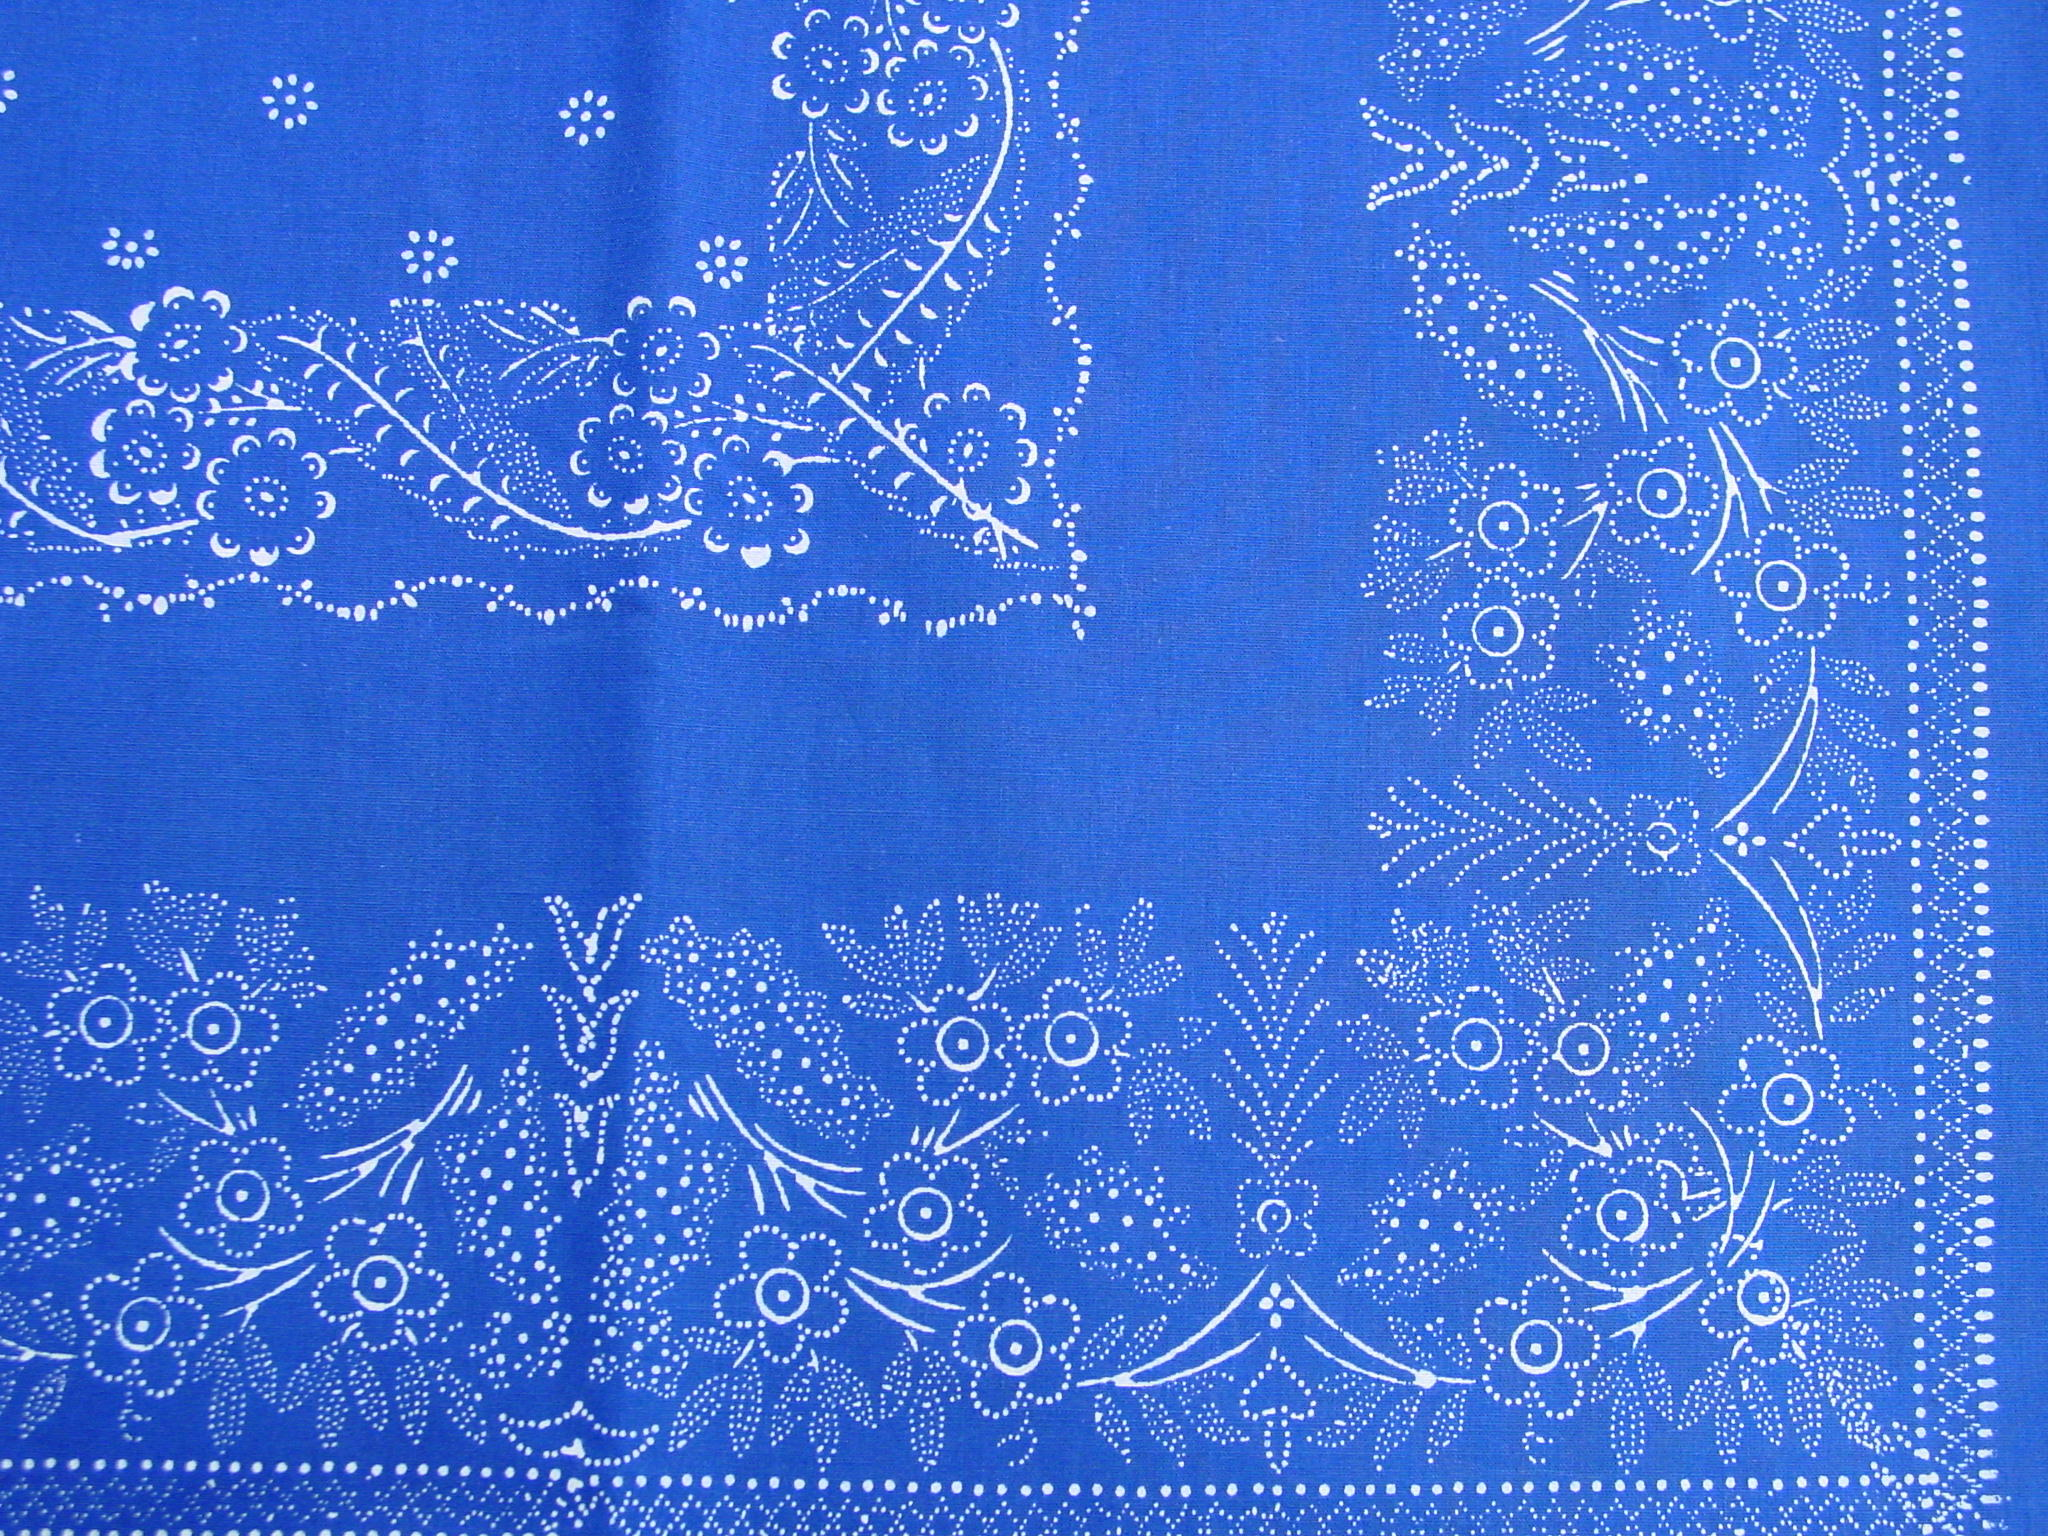 Große Blaudruck-Tischdecke 6481-1287